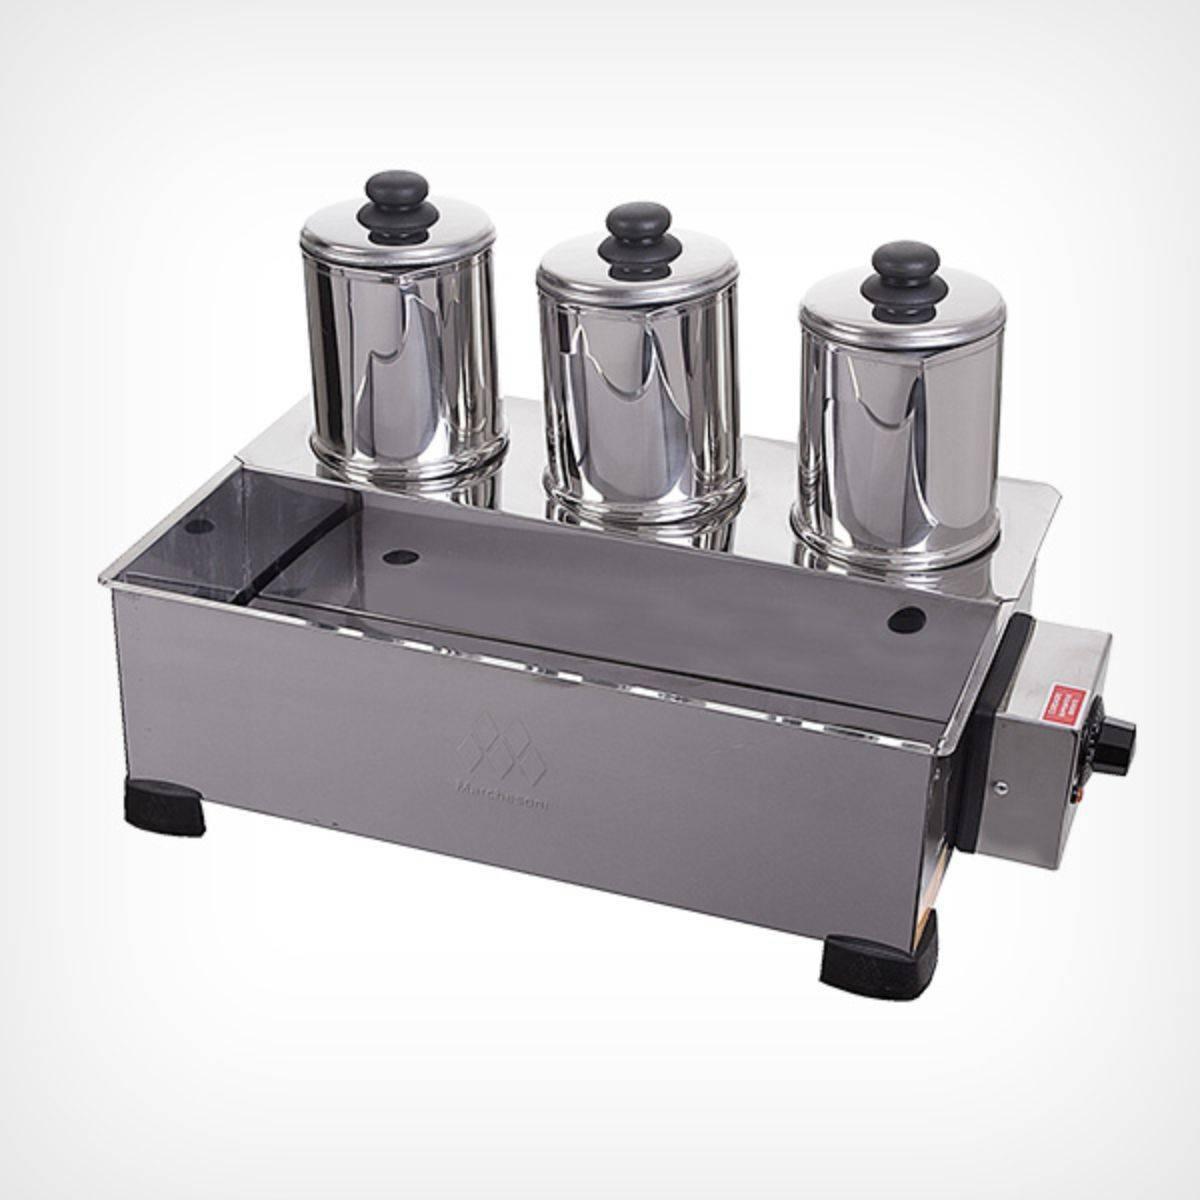 Esterilizador 3 Bules com Termostato ES.1.391/392 Marchesoni